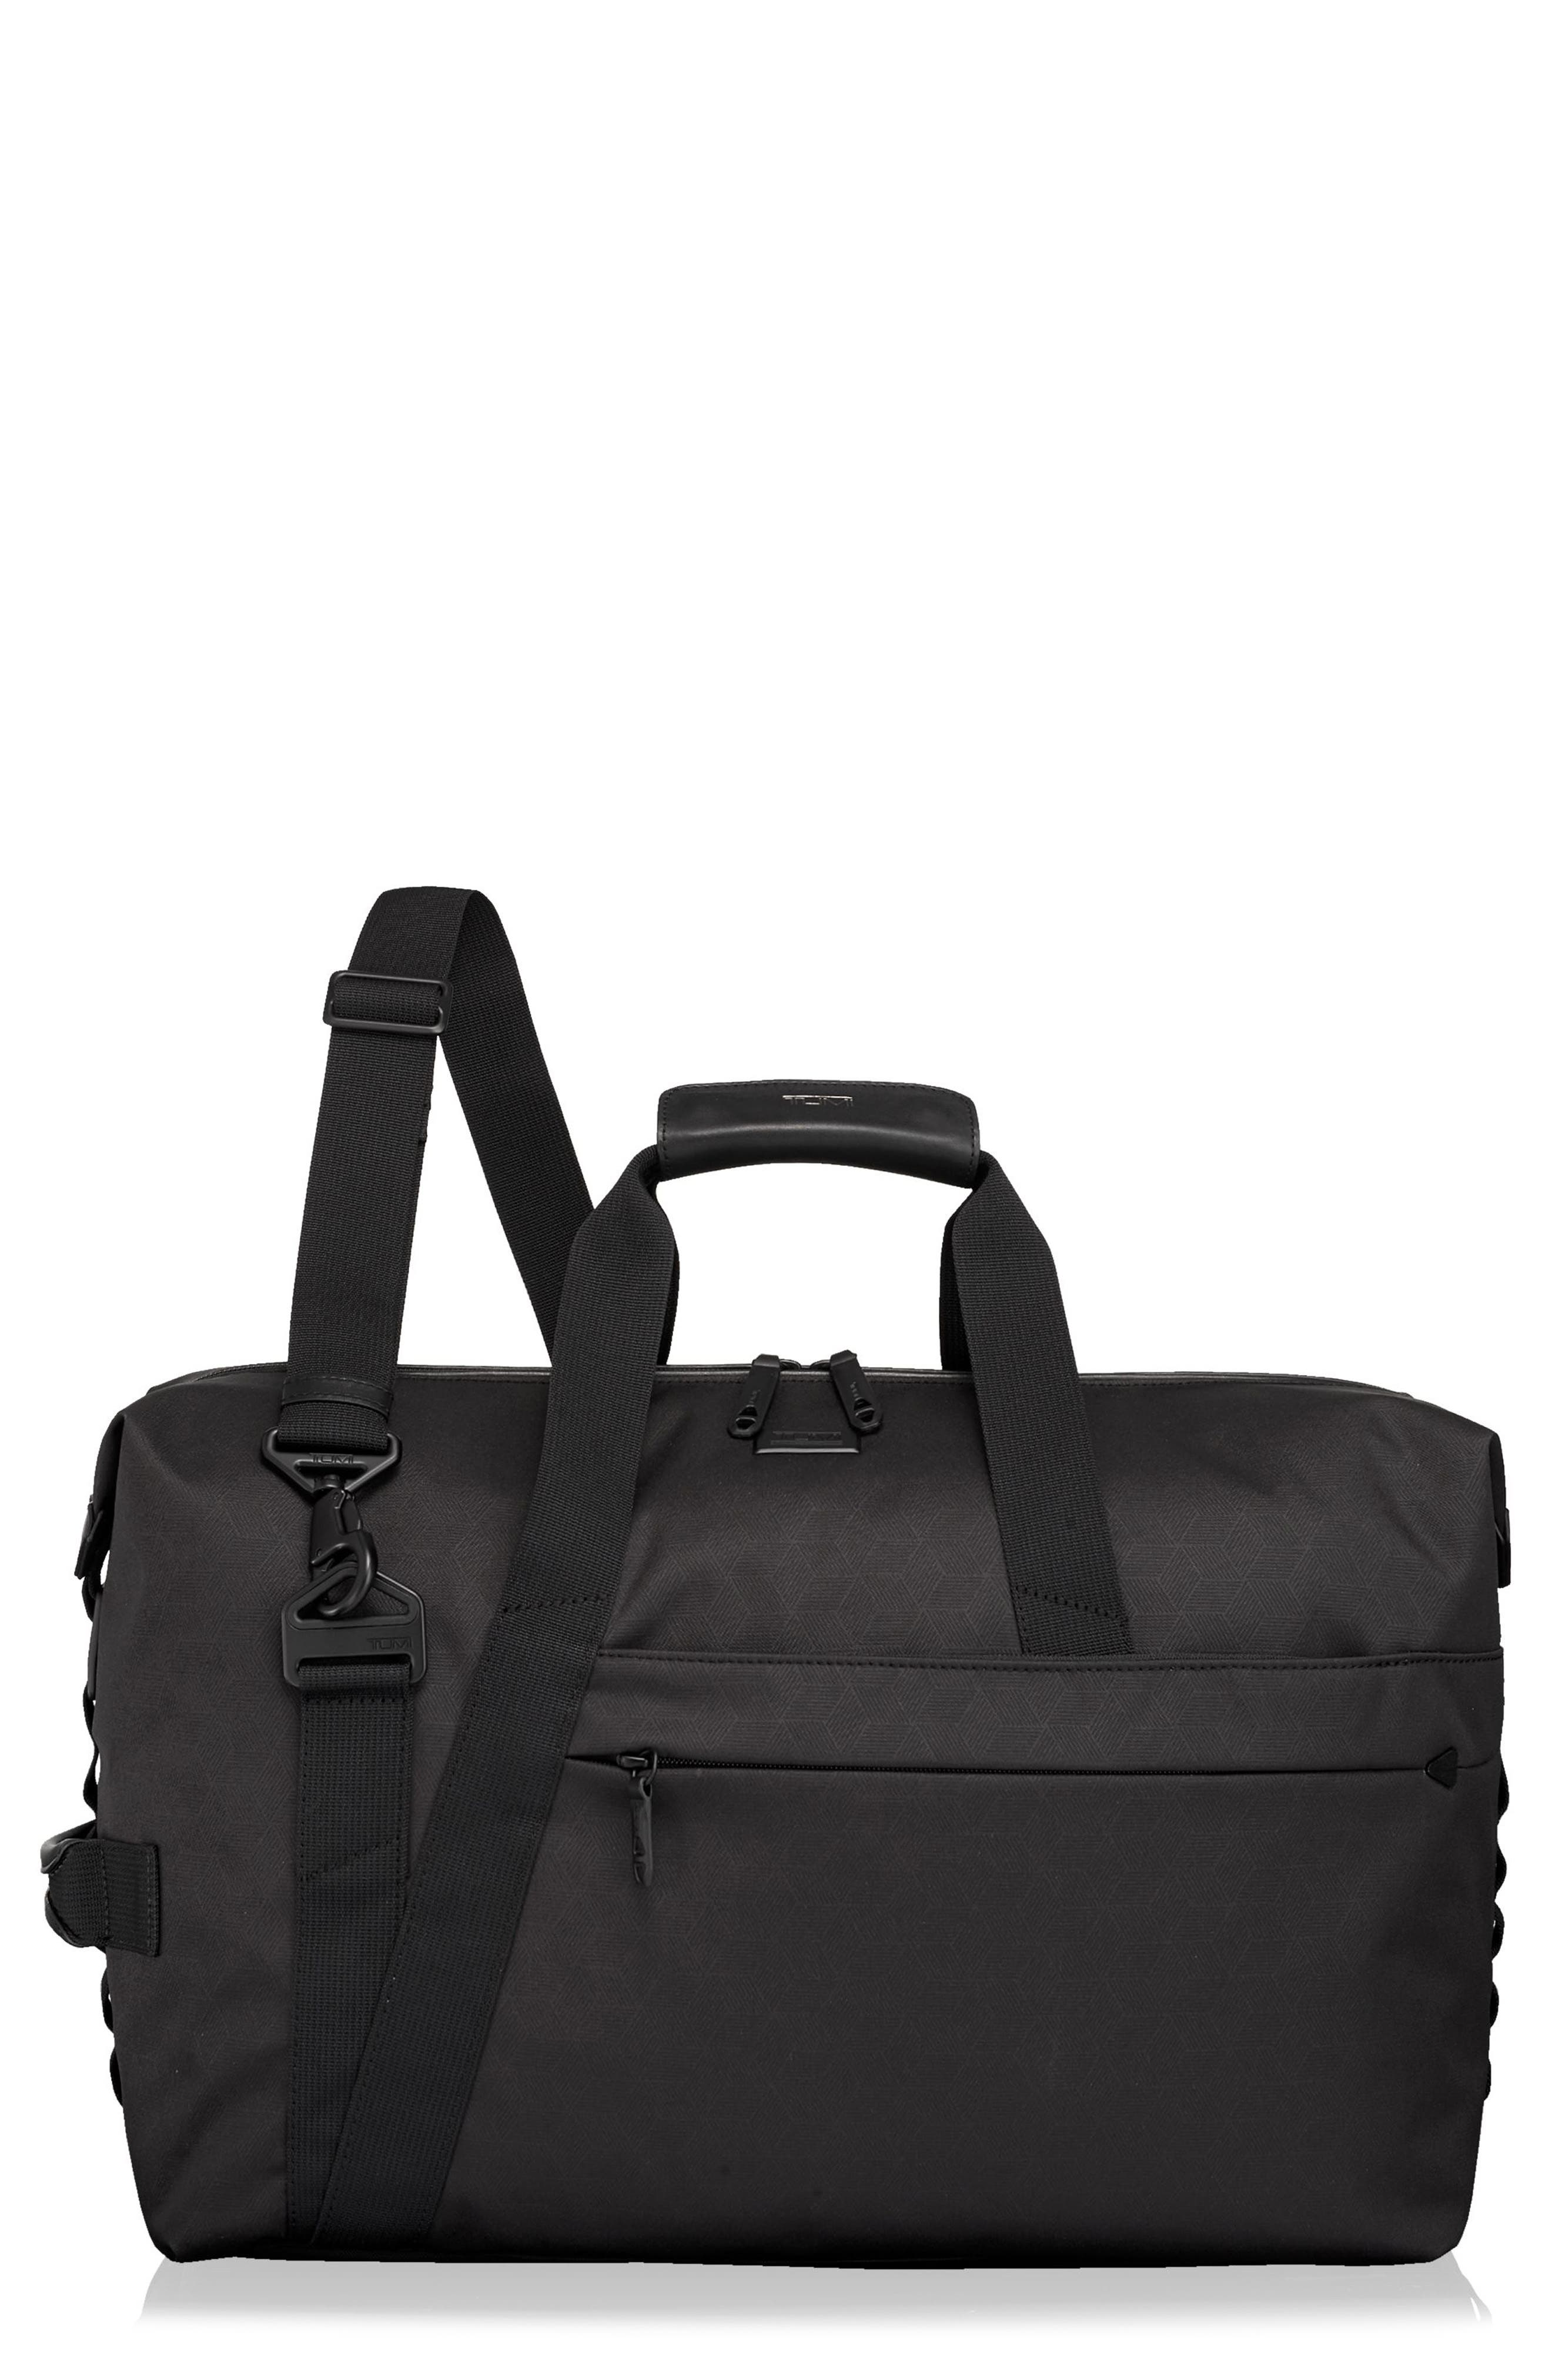 Main Image - Tumi Sonoma Duffel Bag